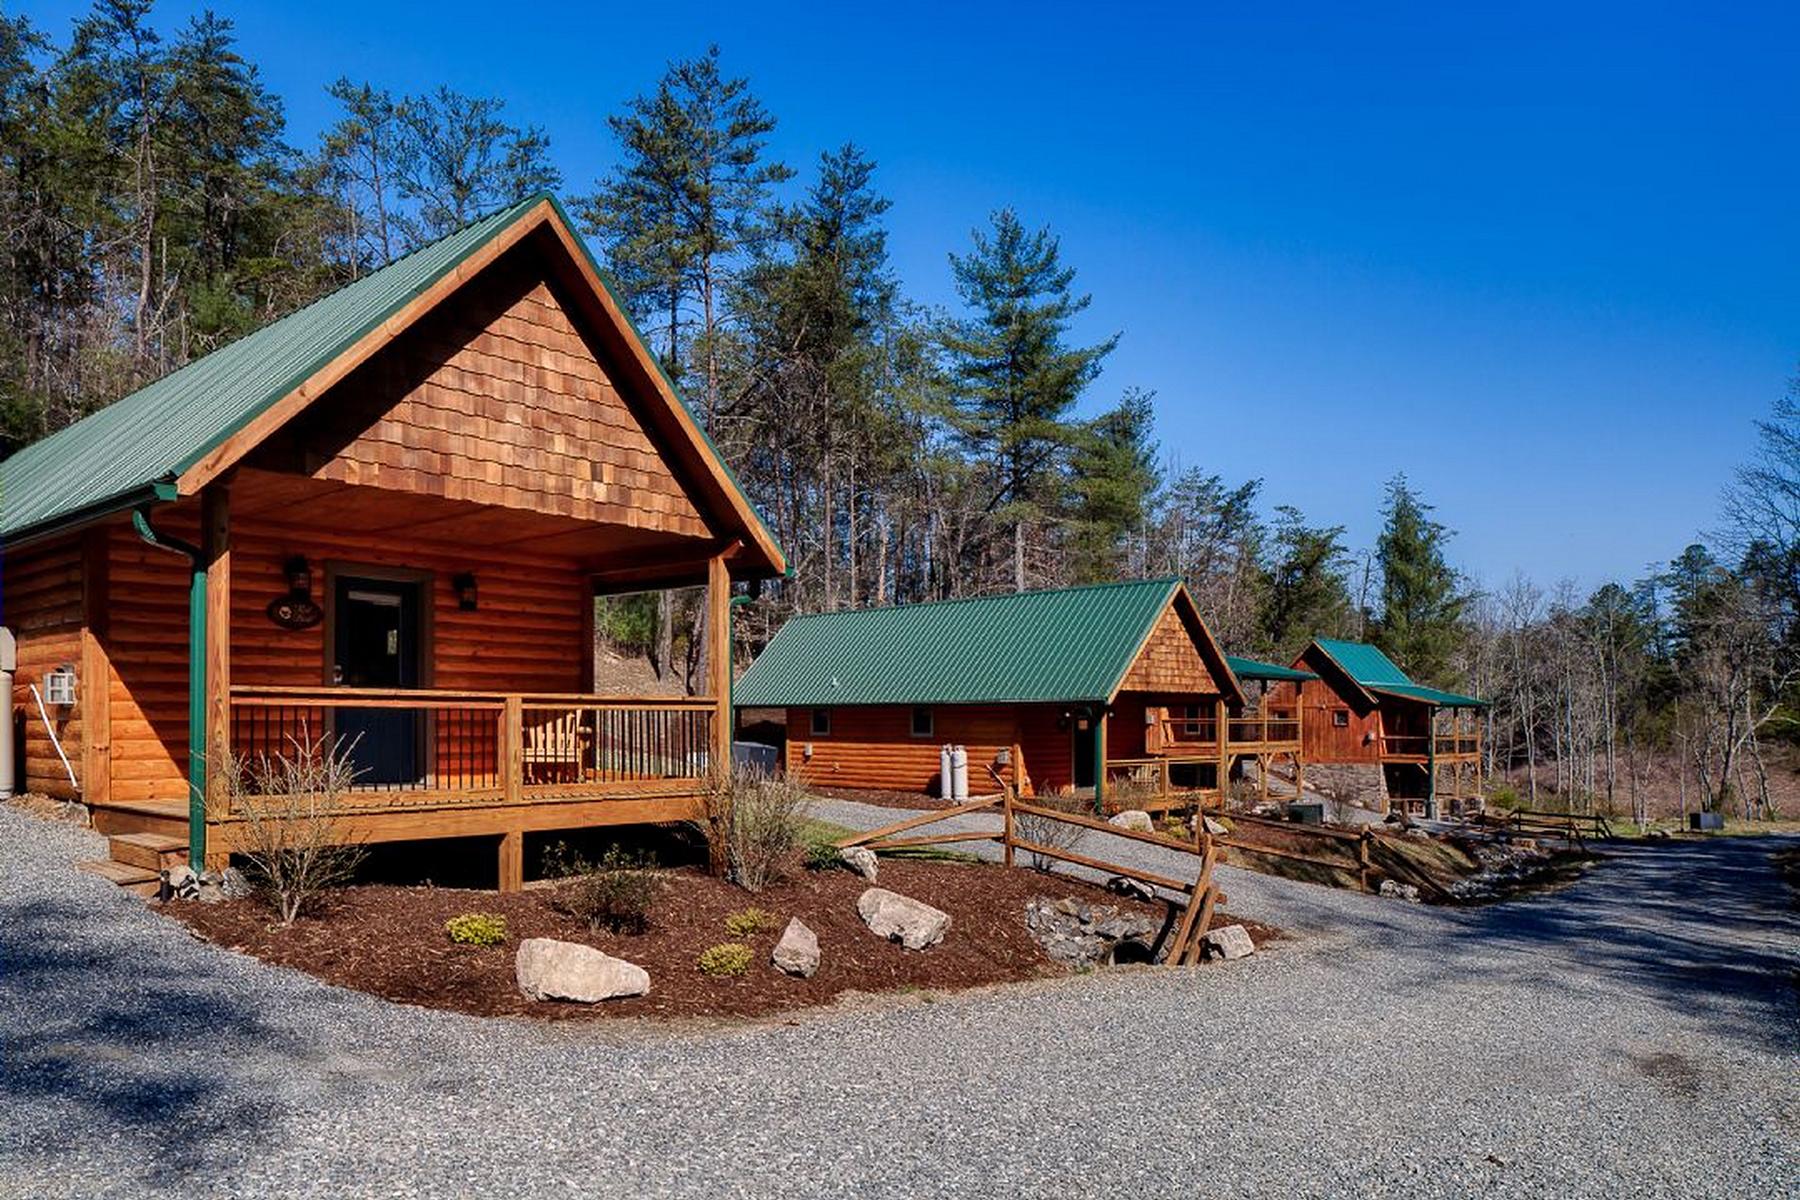 Multi-Family Home for Sale at LAUREL MOUNTAIN RETREAT 6 Deerborne Ln, Weaverville, North Carolina, 28787 United StatesIn/Around: Asheville